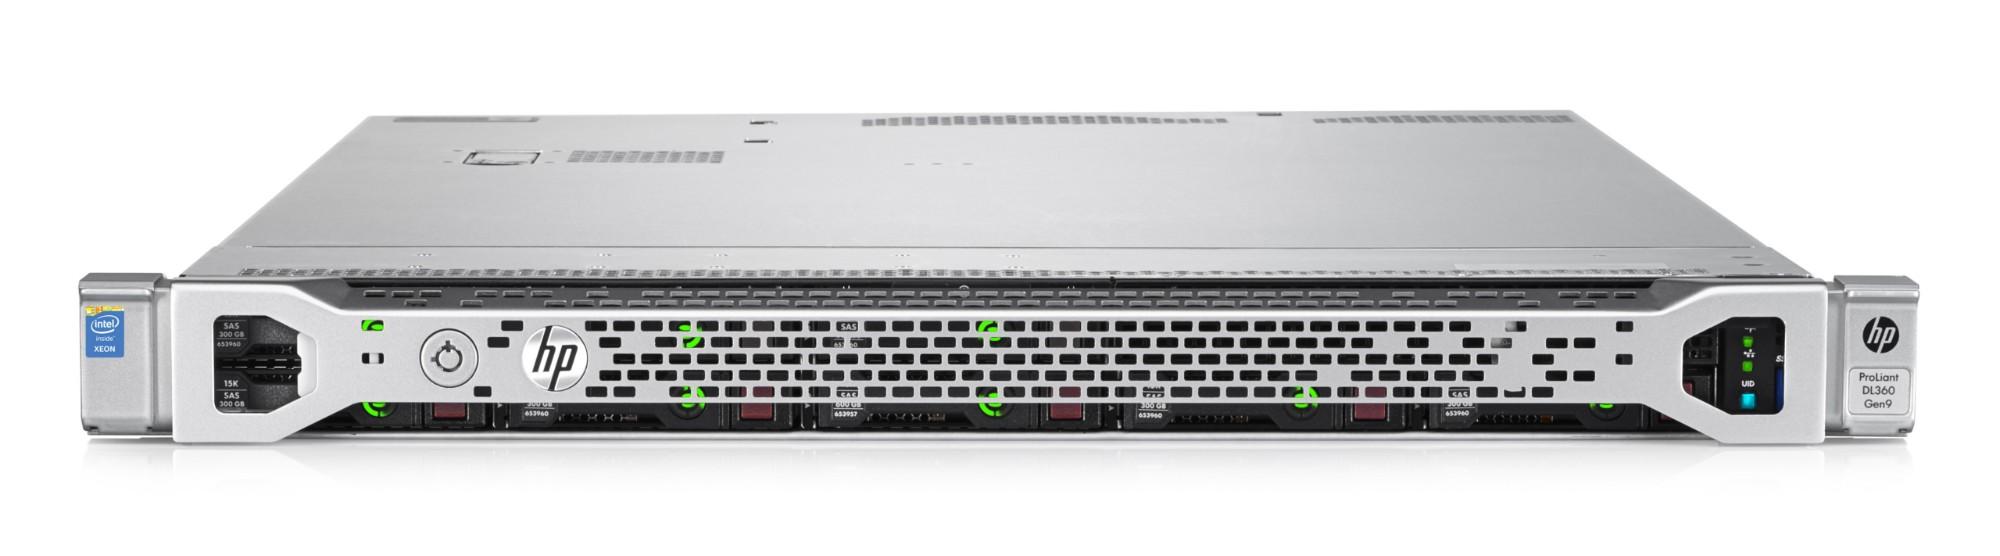 Hewlett Packard Enterprise ProLiant DL360 Gen9 2.4GHz E5-2630V3 500W Rack (1U) server